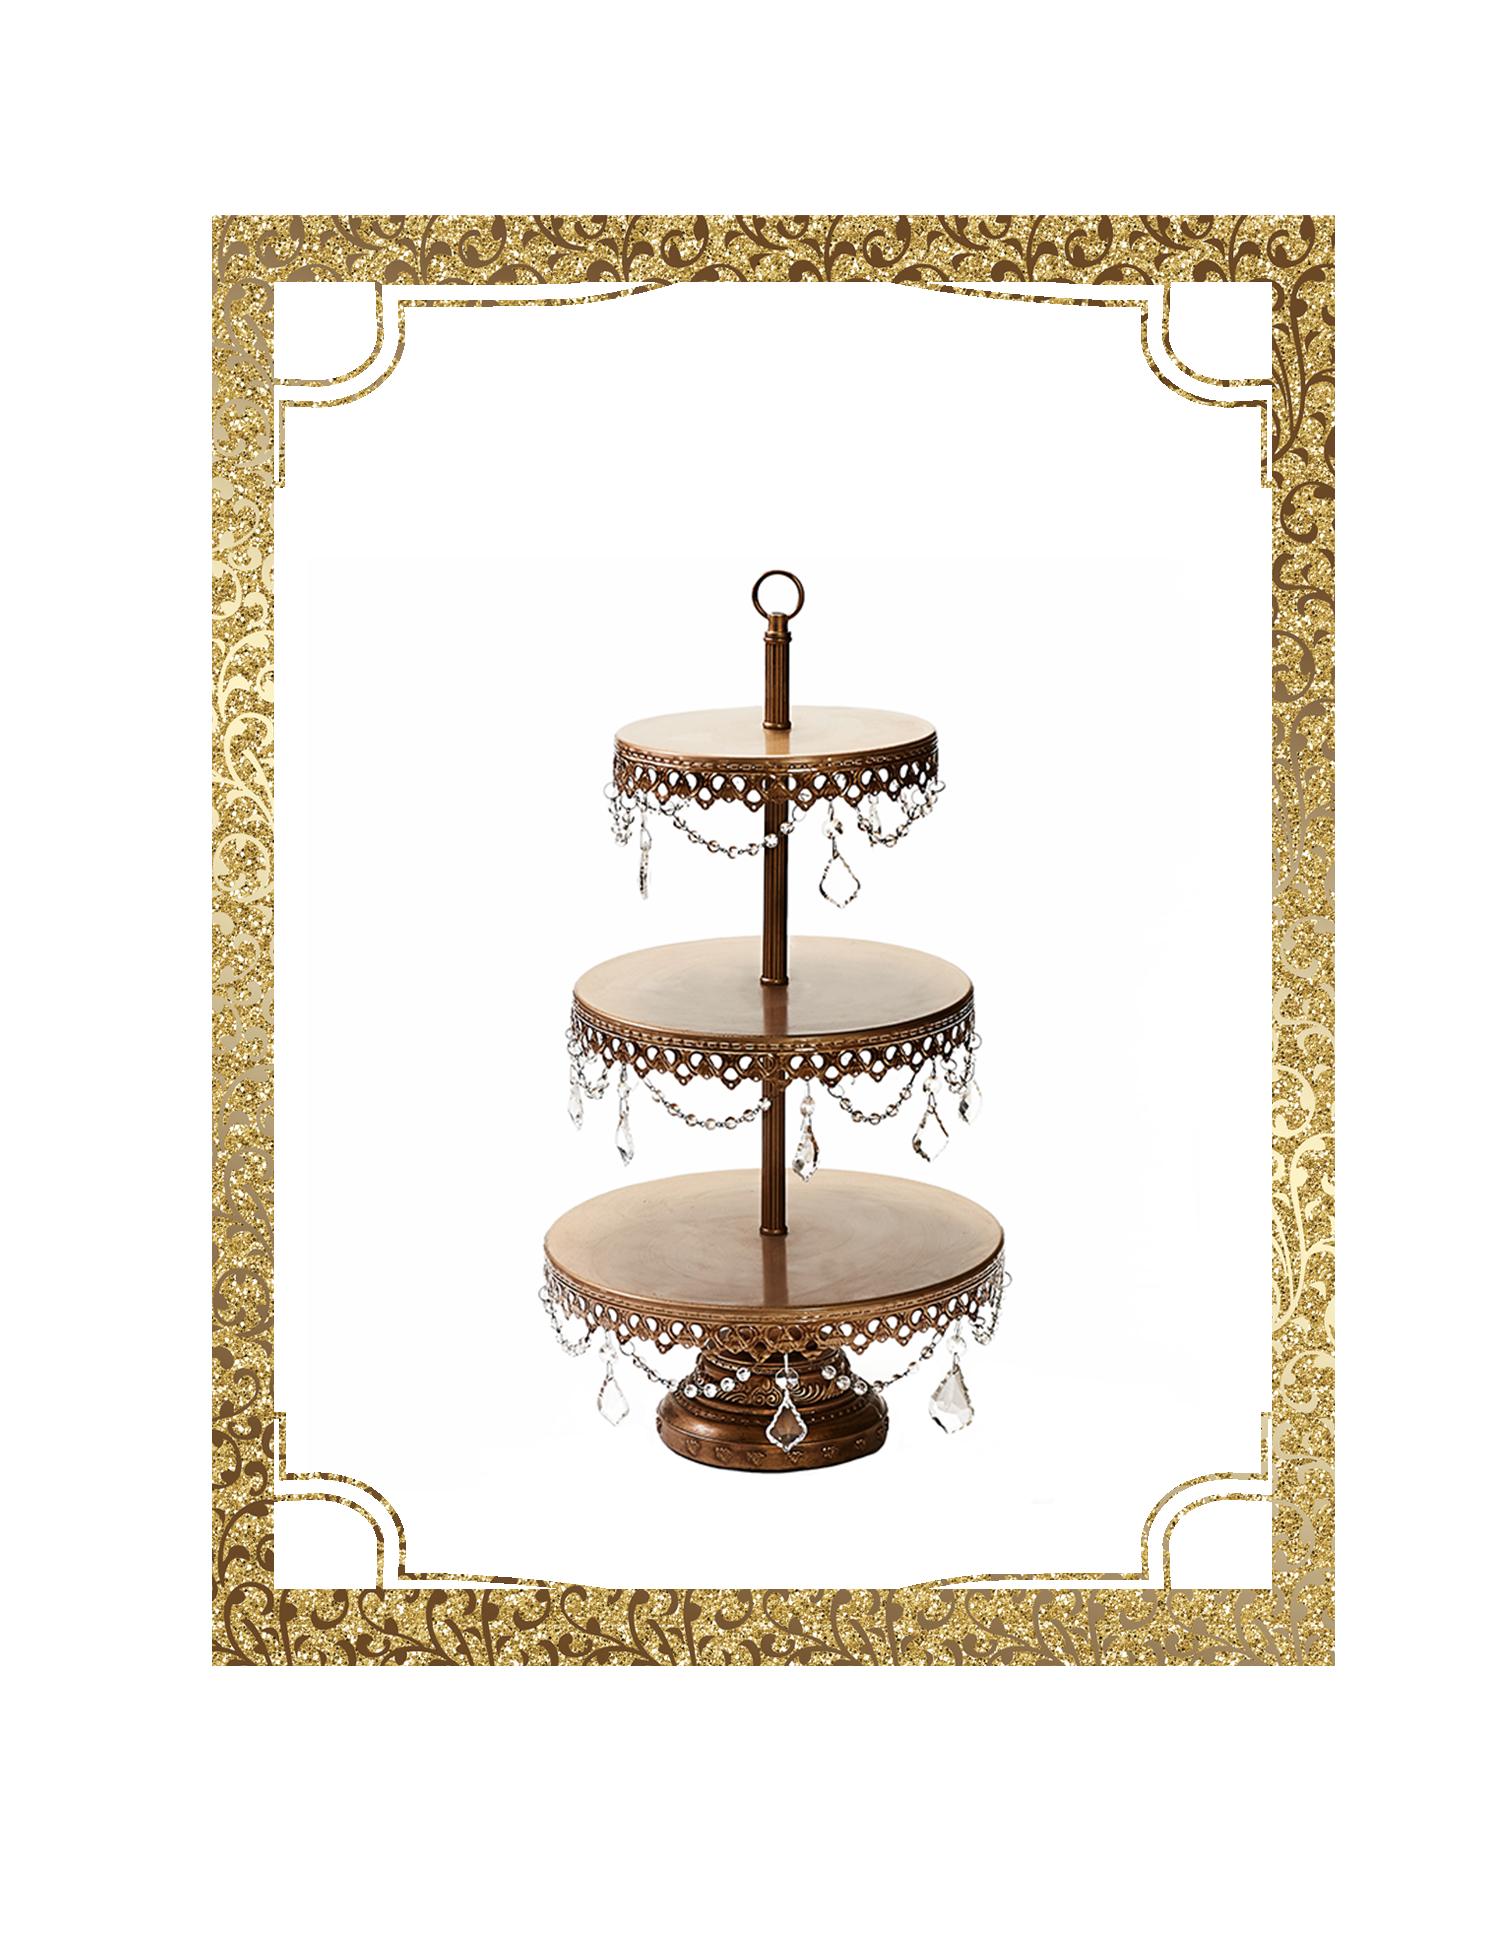 SHOP-preview ANTIQUE GOLD 3 tier chandelier dessert stand.png